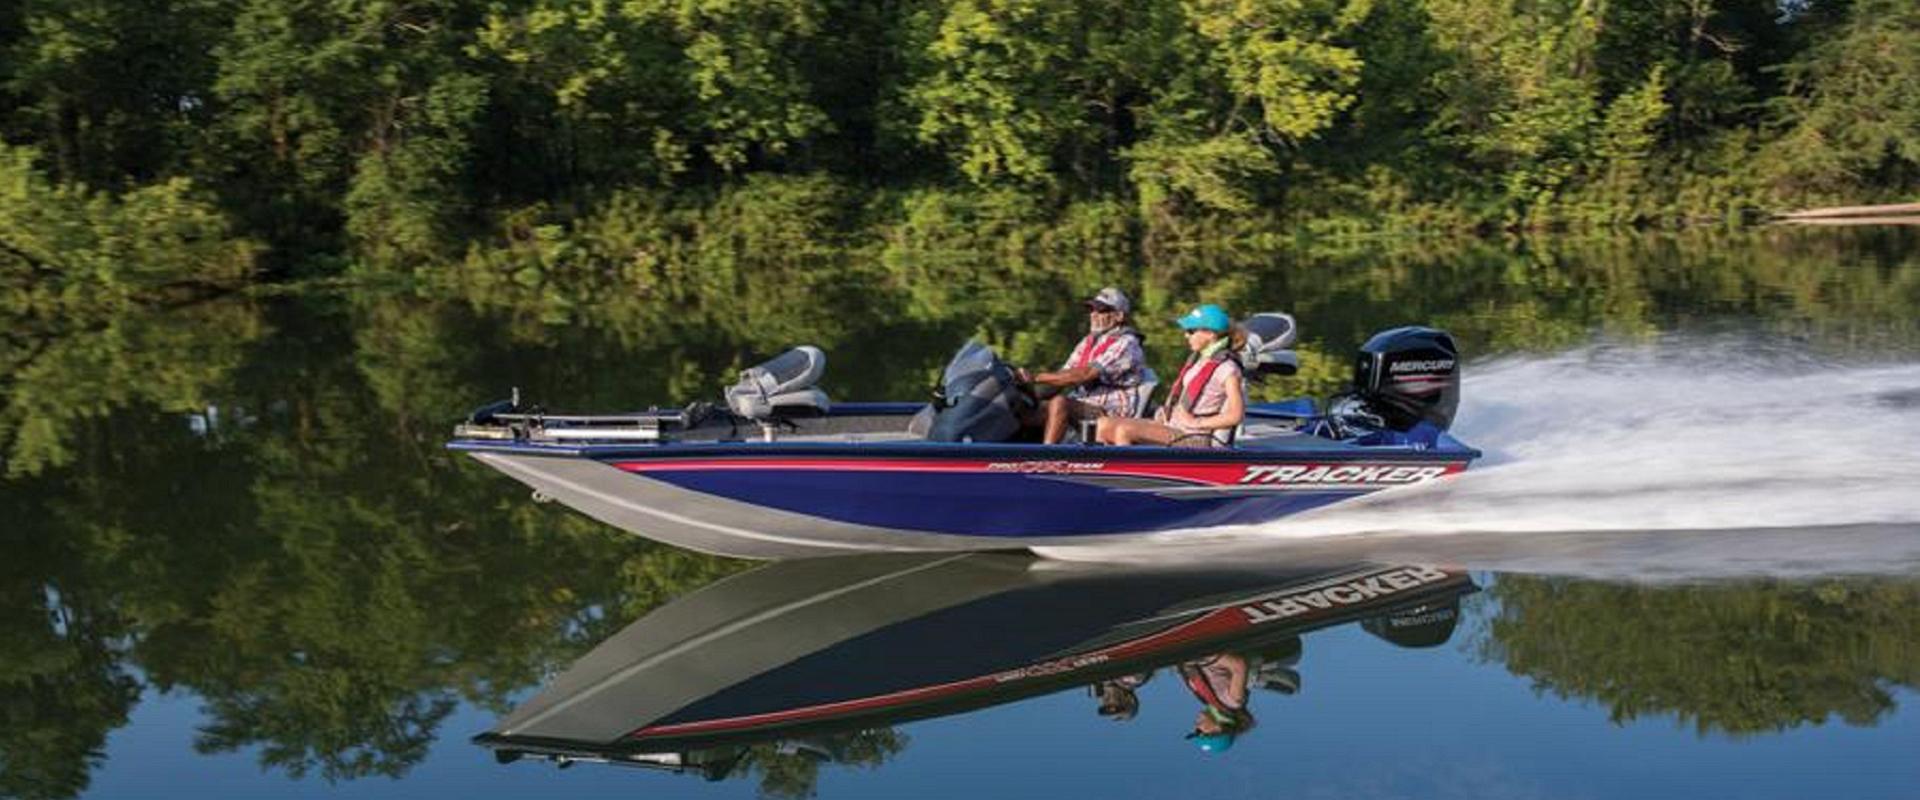 Tracker Nitro Boat Parts Bass 175 Txw Wiring Diagram Central Kentuckys Premier Dealer Stokleys Marine 1920x800